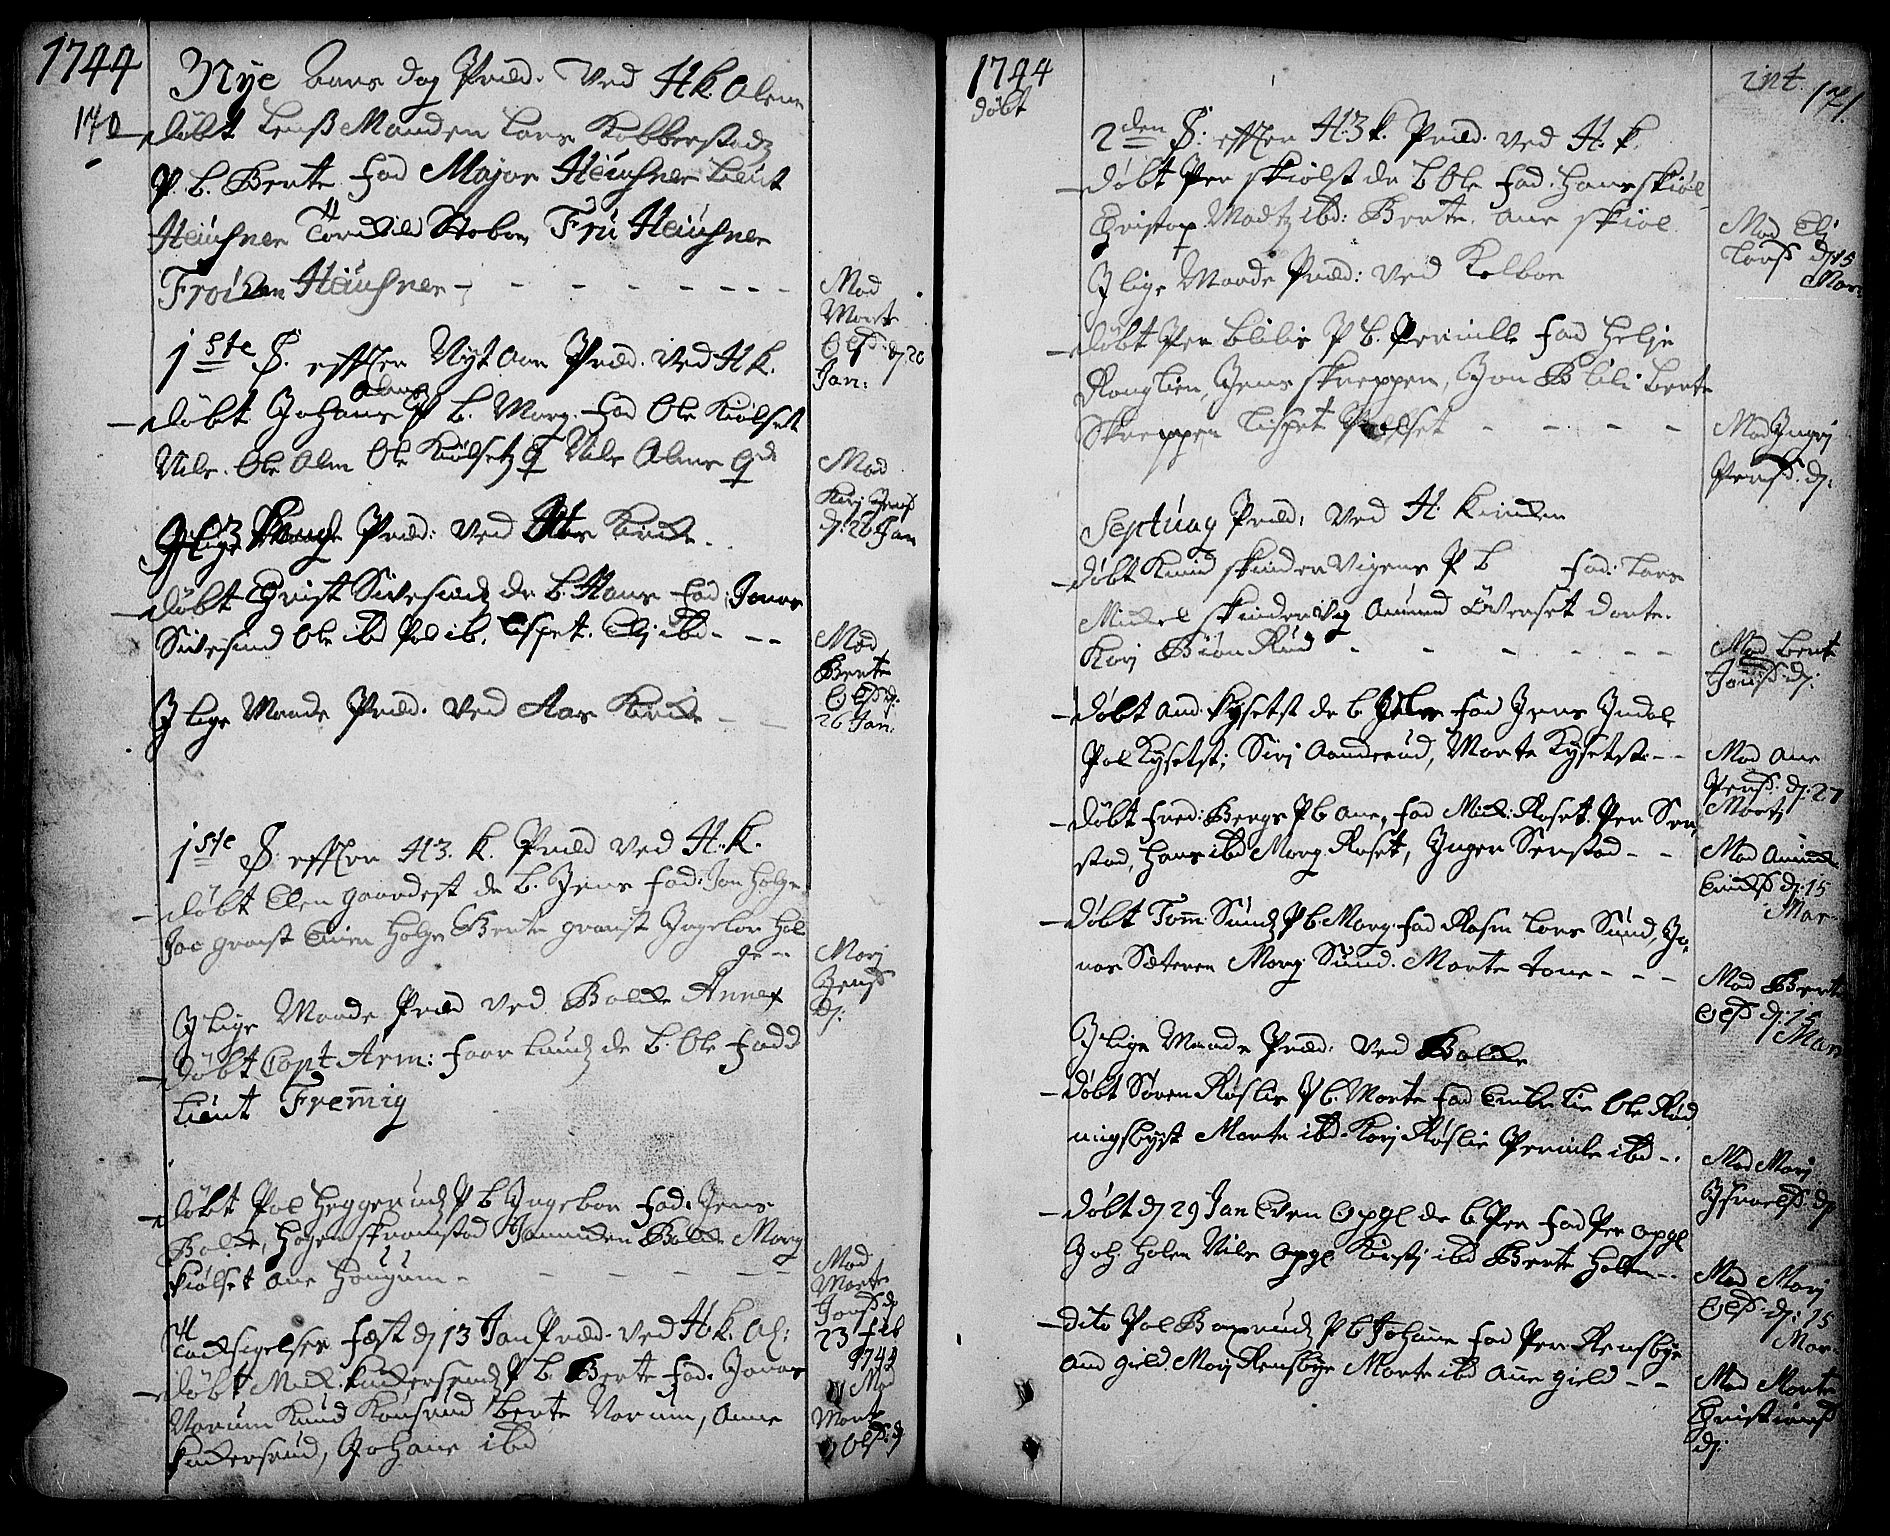 SAH, Toten prestekontor, Ministerialbok nr. 3, 1734-1751, s. 170-171